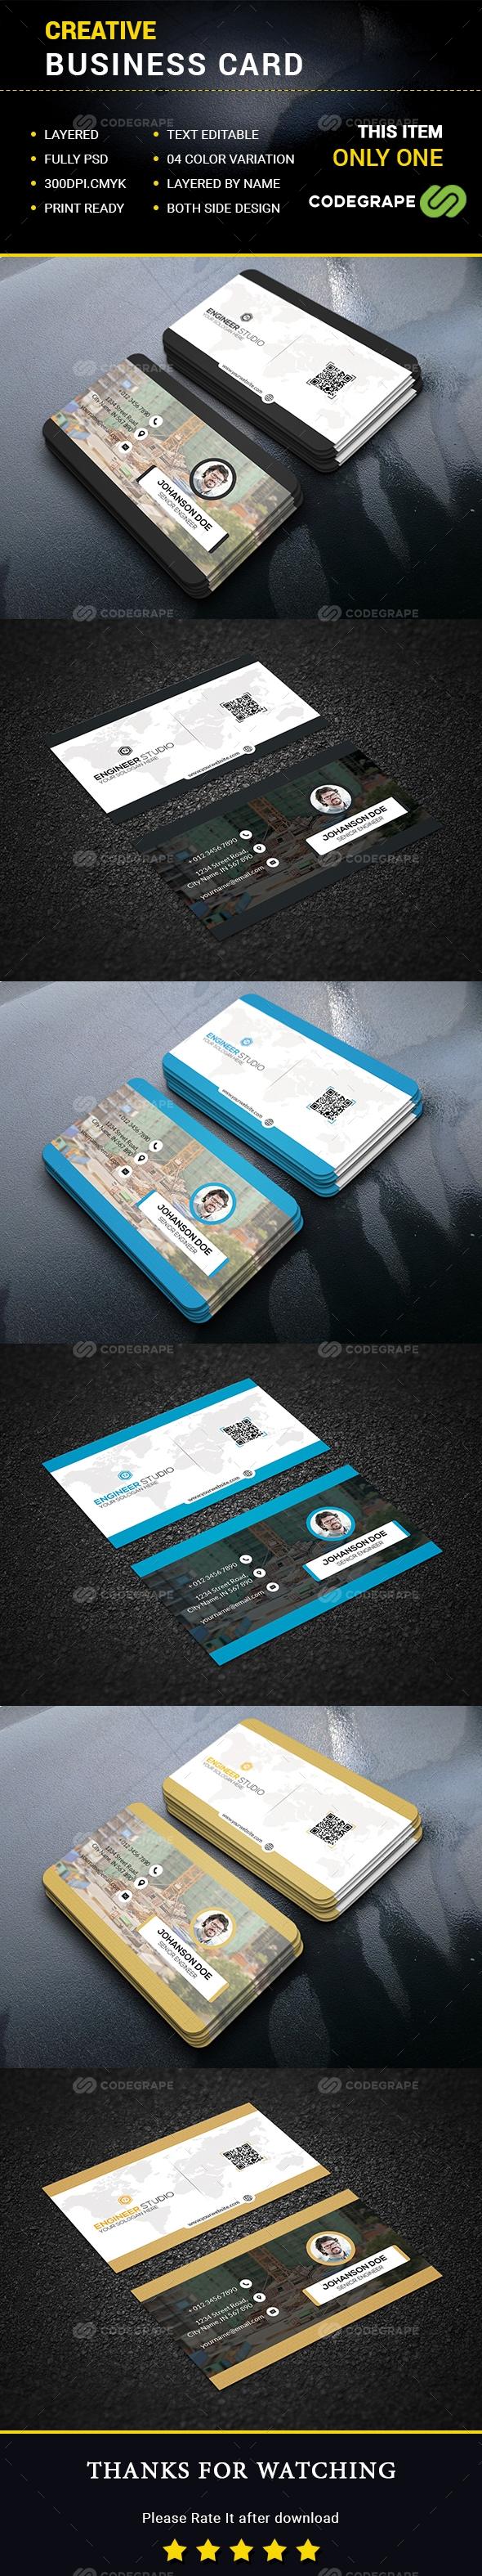 Creative Business Card 02